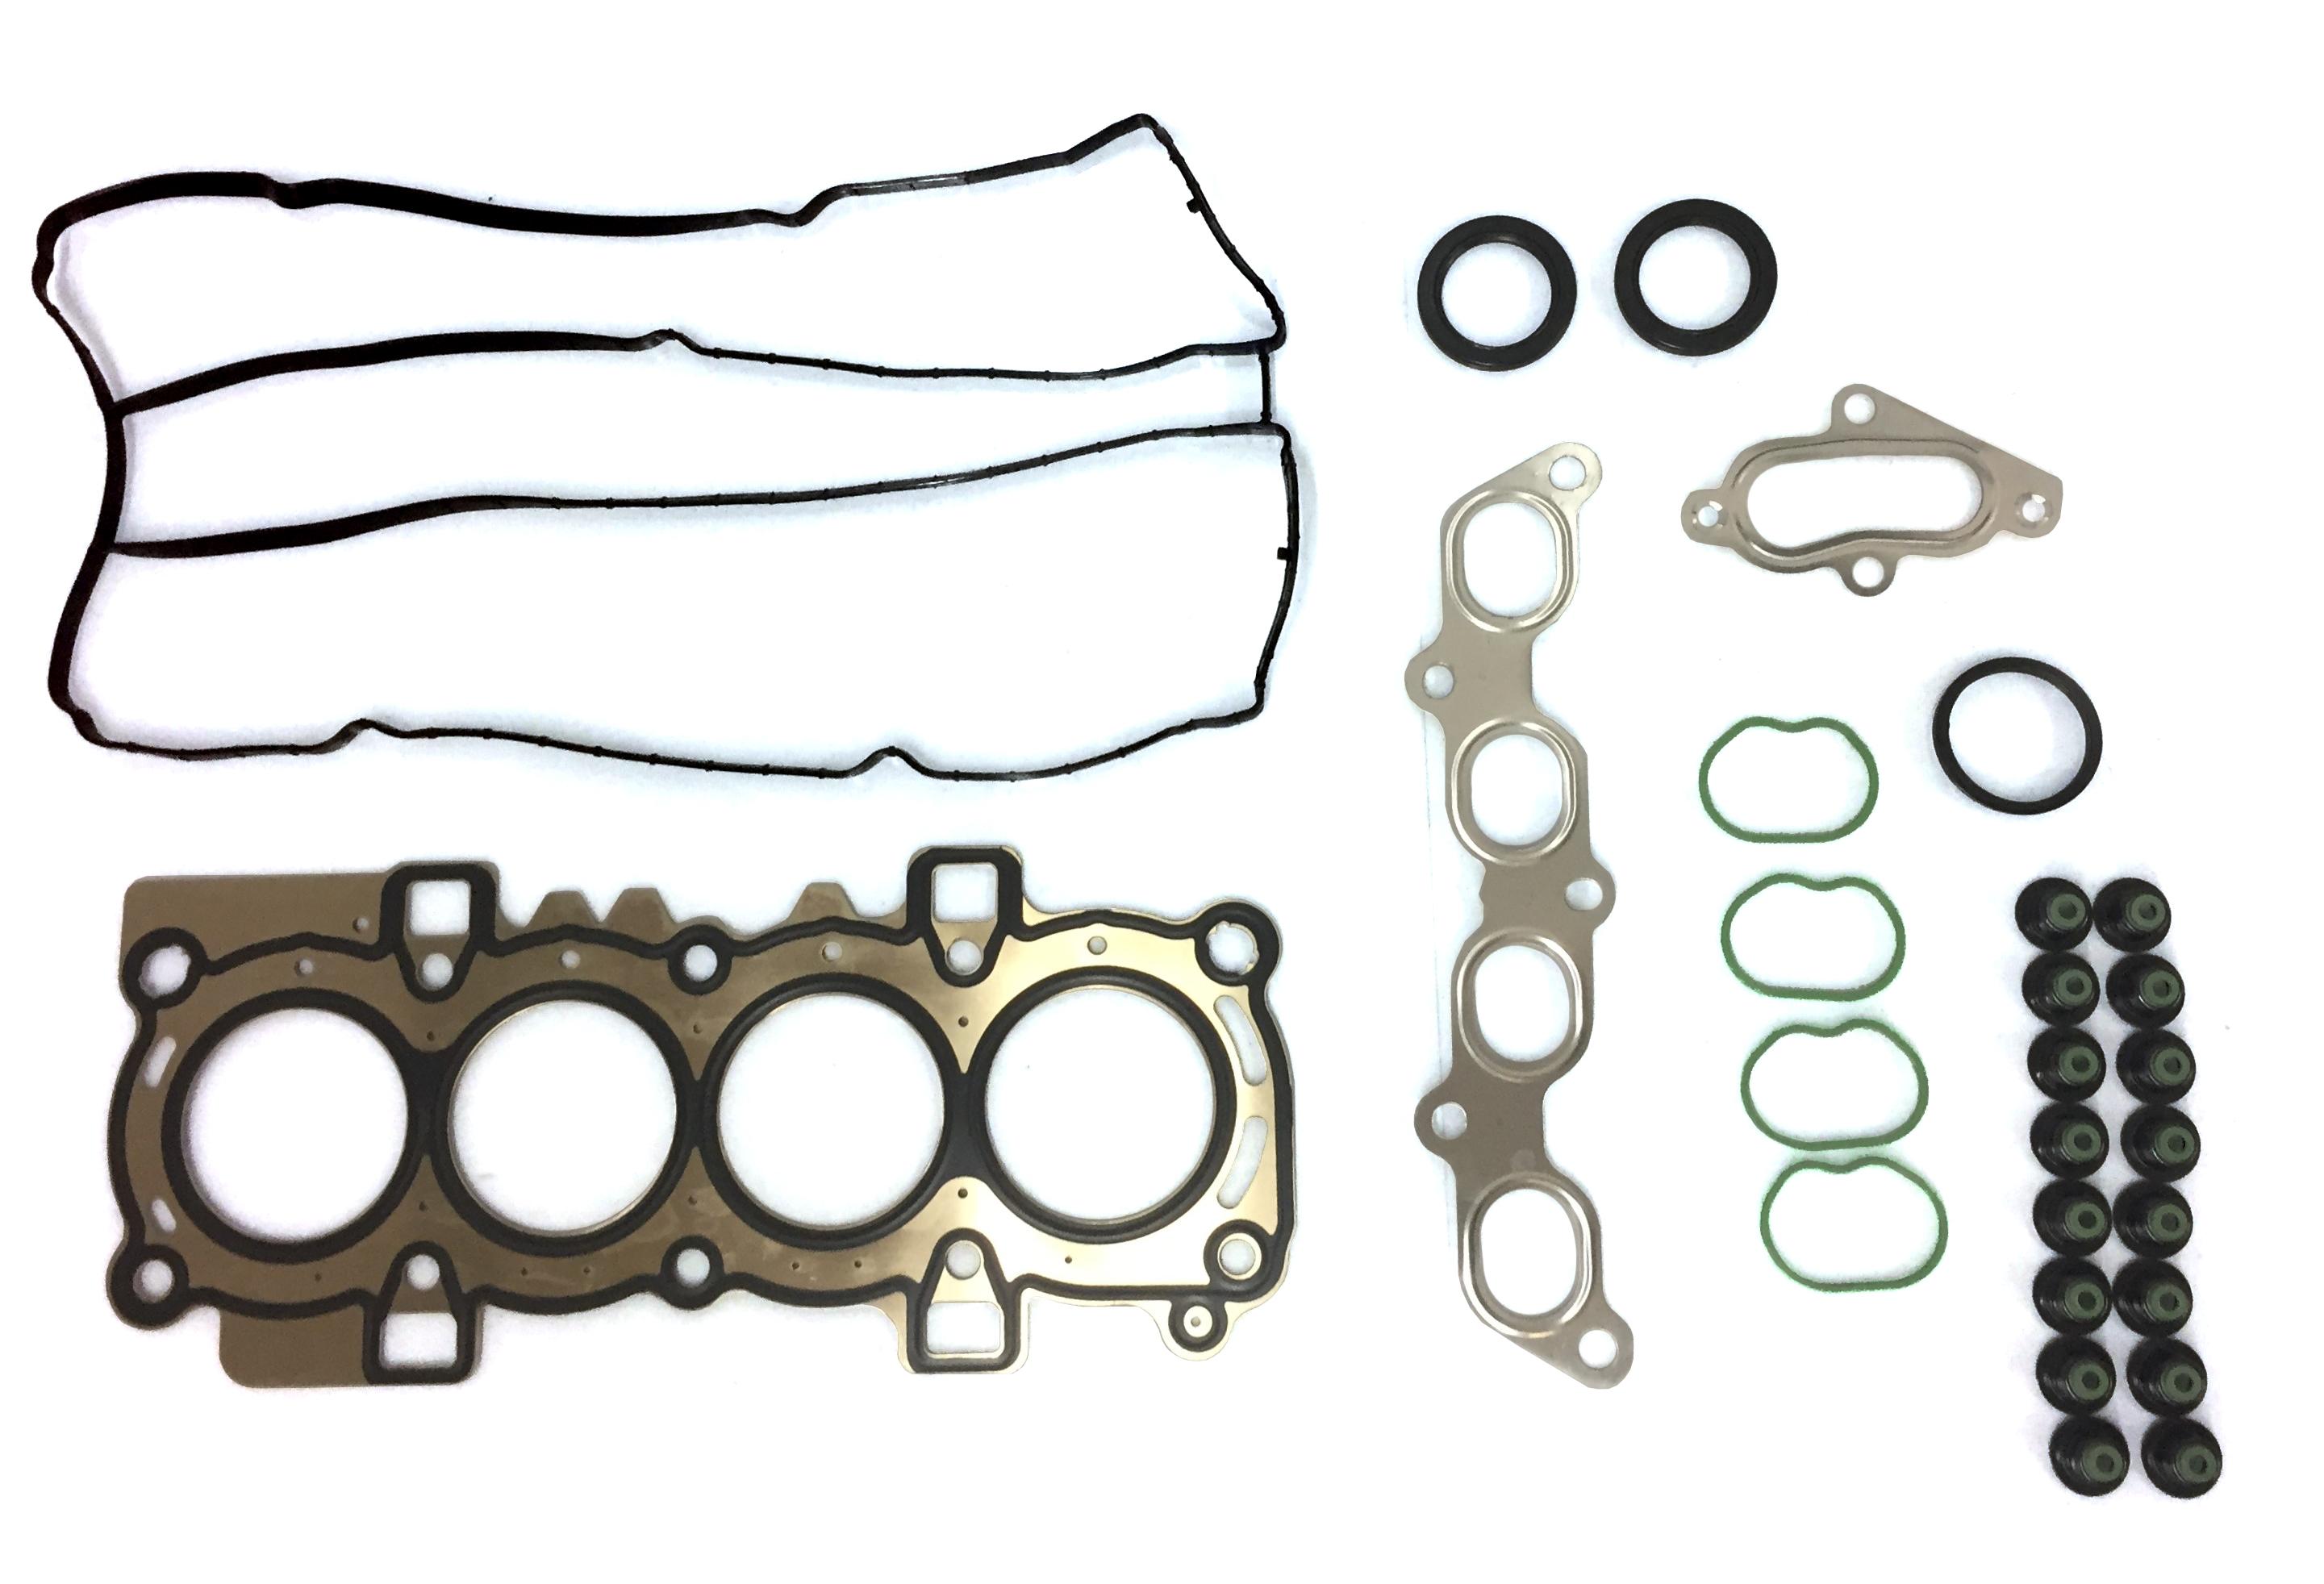 Dichtungssatz Zylinderkopfdichtung Ford Fiesta VI 1,25 SNJA 1538349 NEU